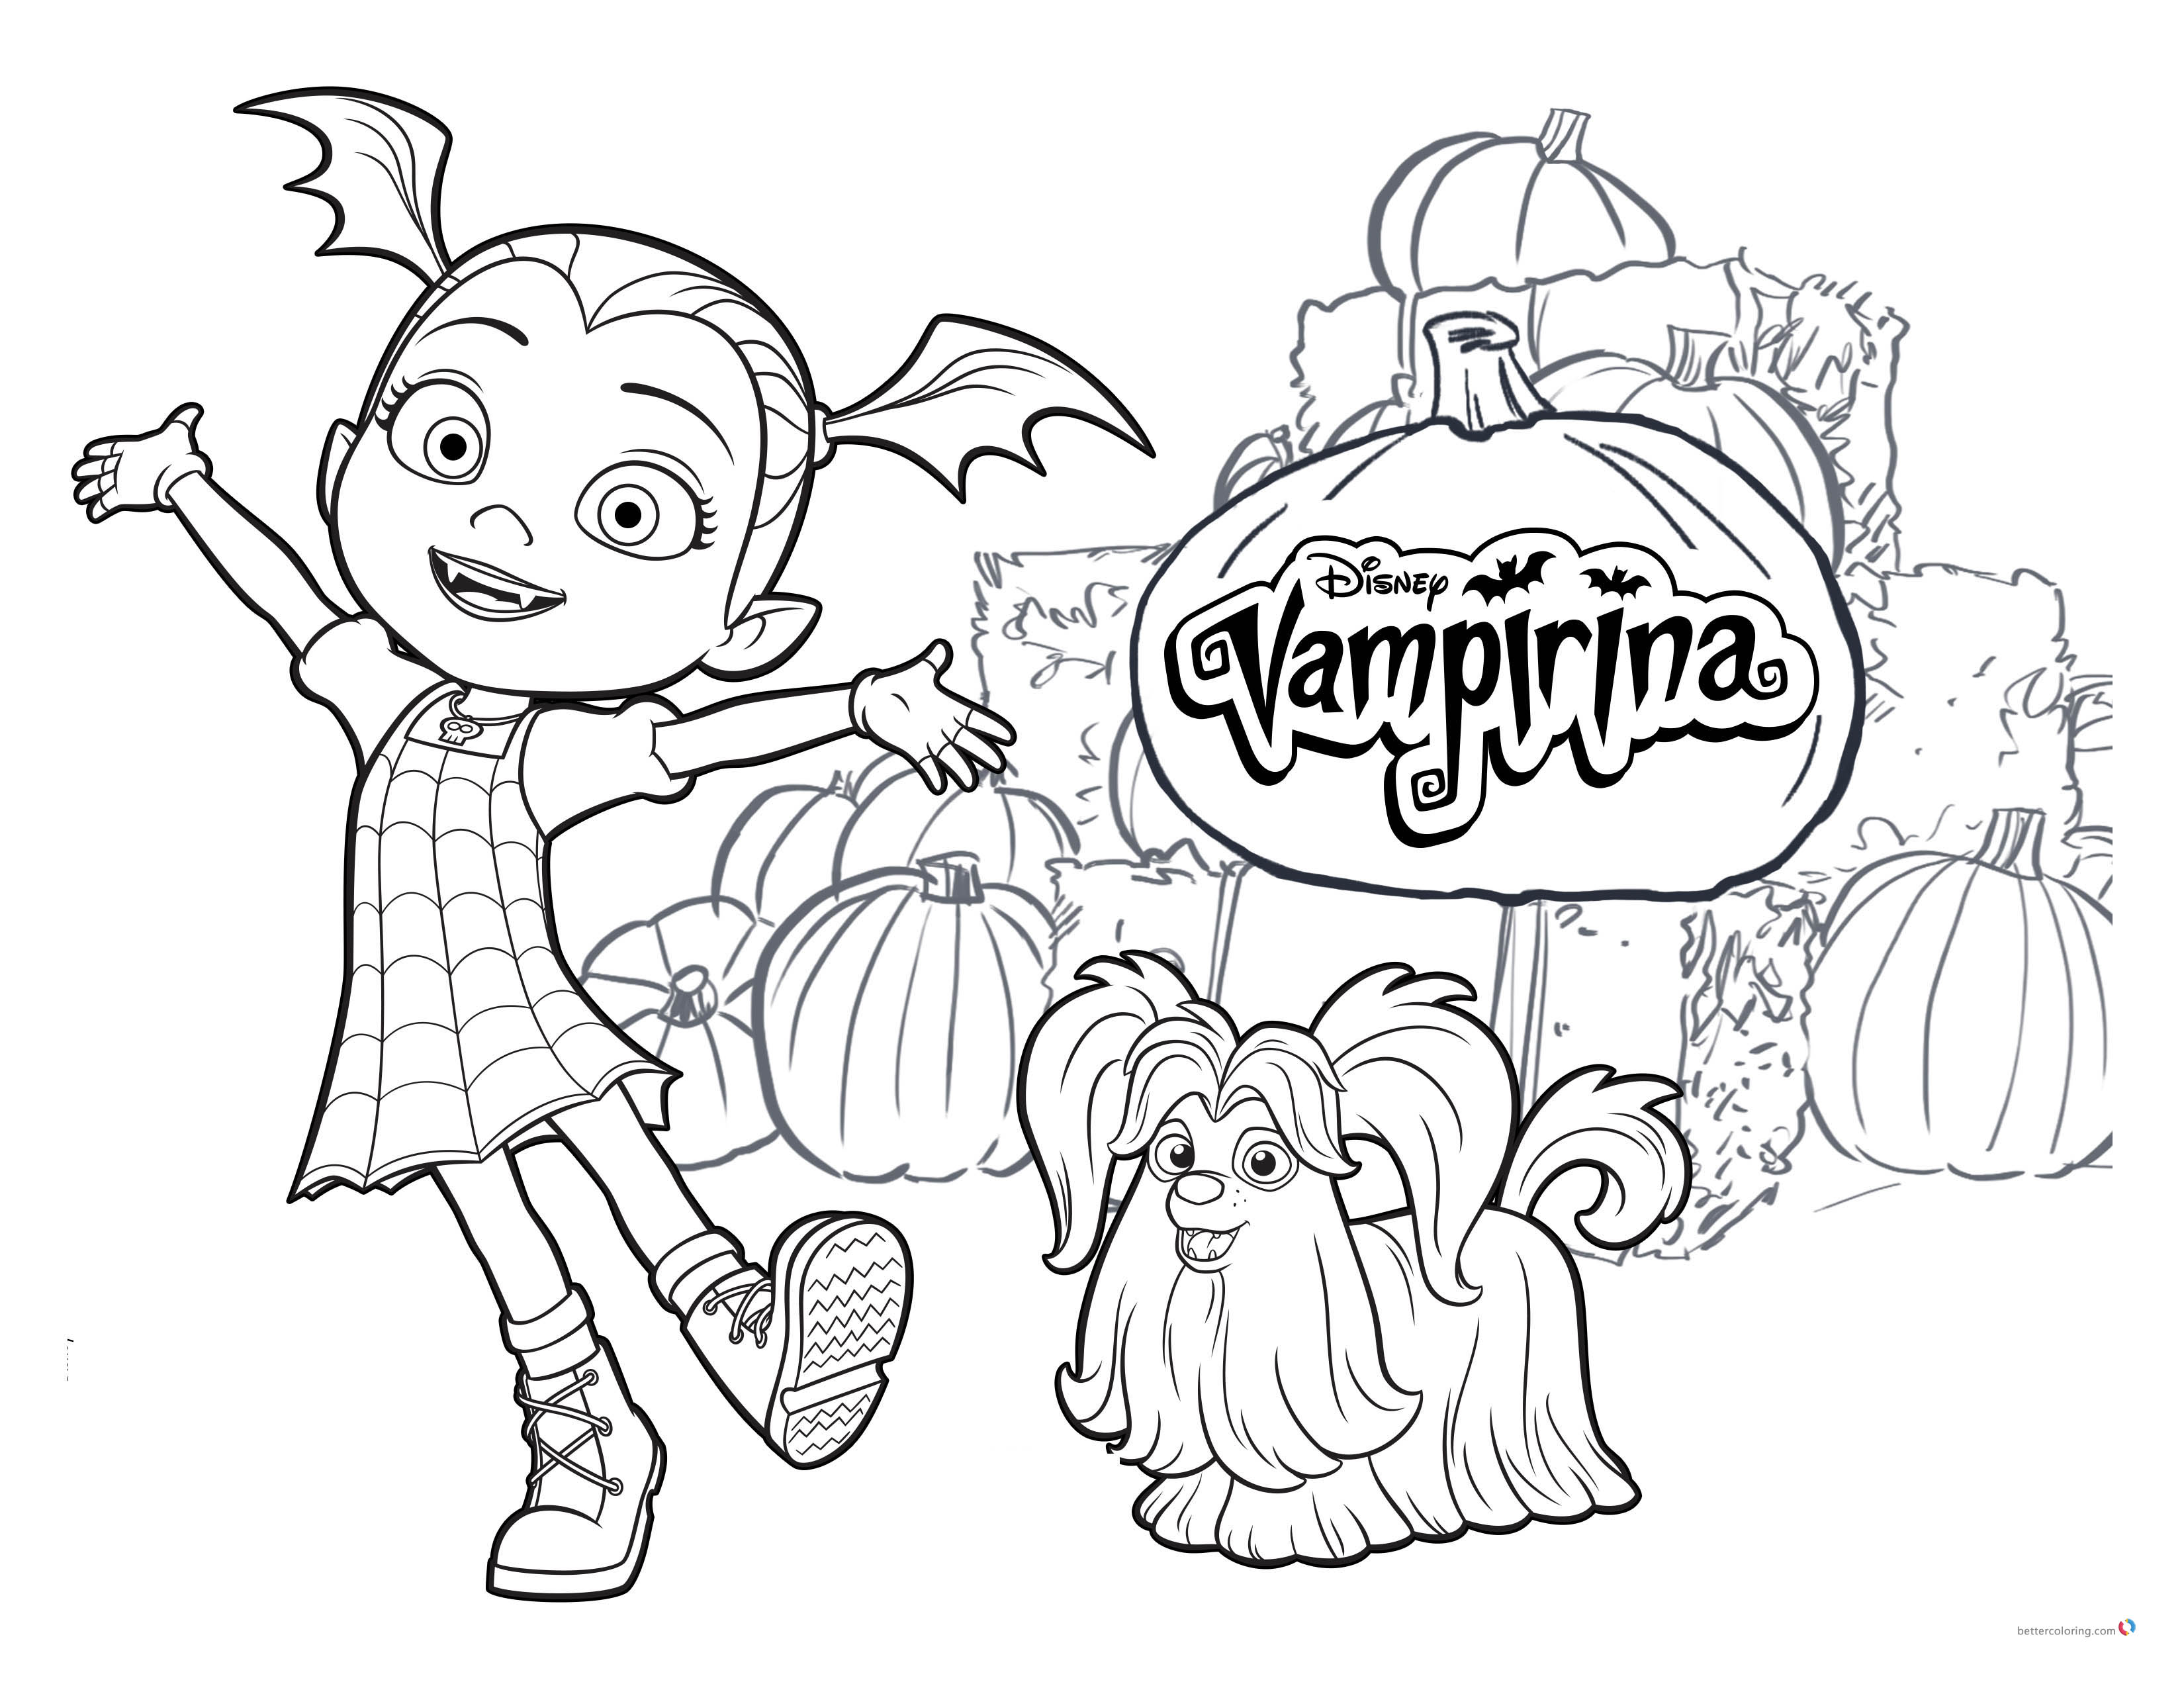 Vampirina coloring pages Vampirina and Wolfie printable